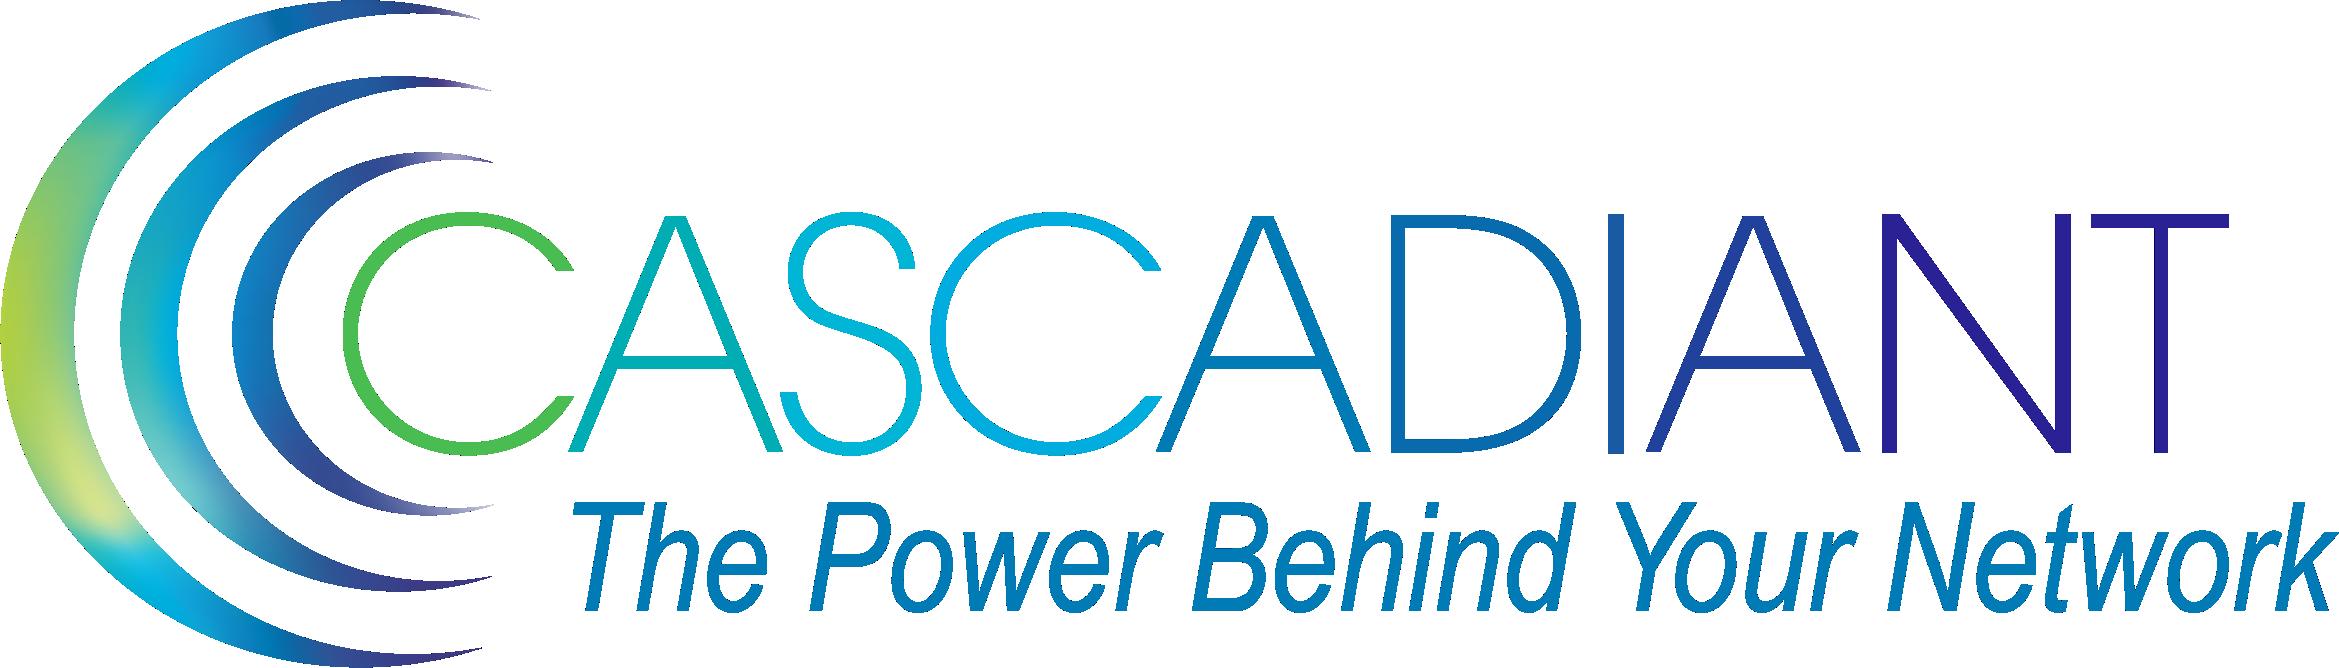 Cascadiant logo